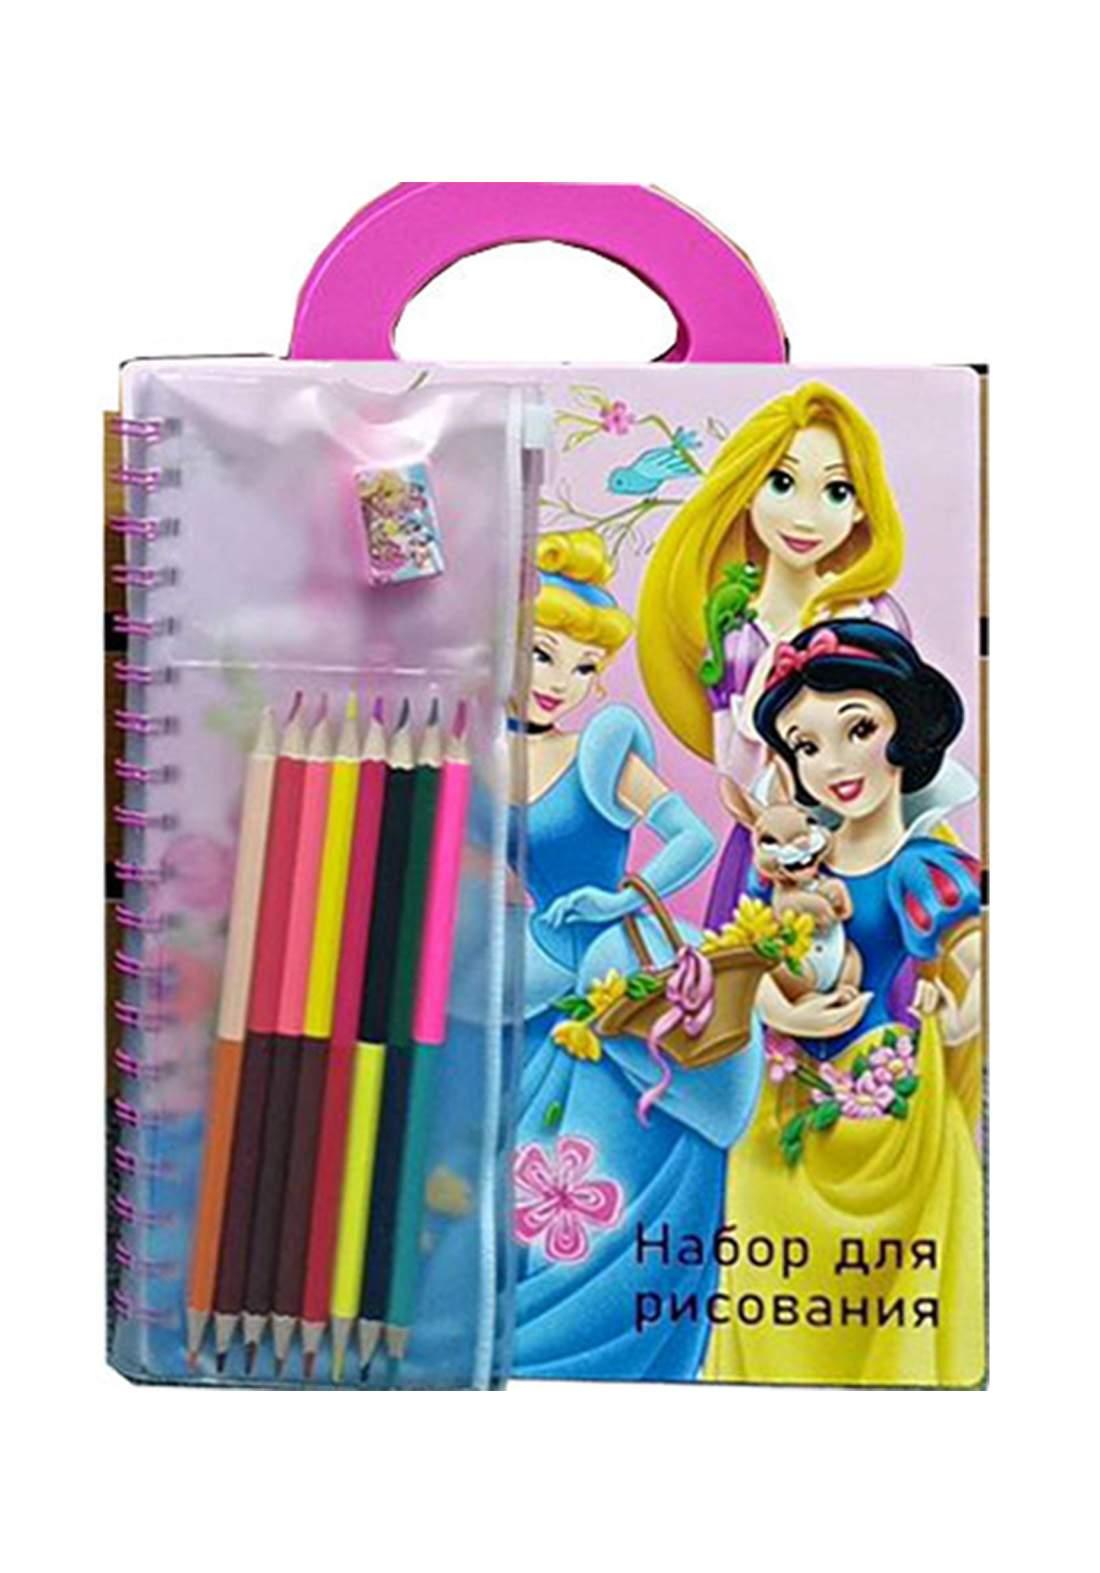 Disney Princess coloring Book دفتر تلوين الاميرات